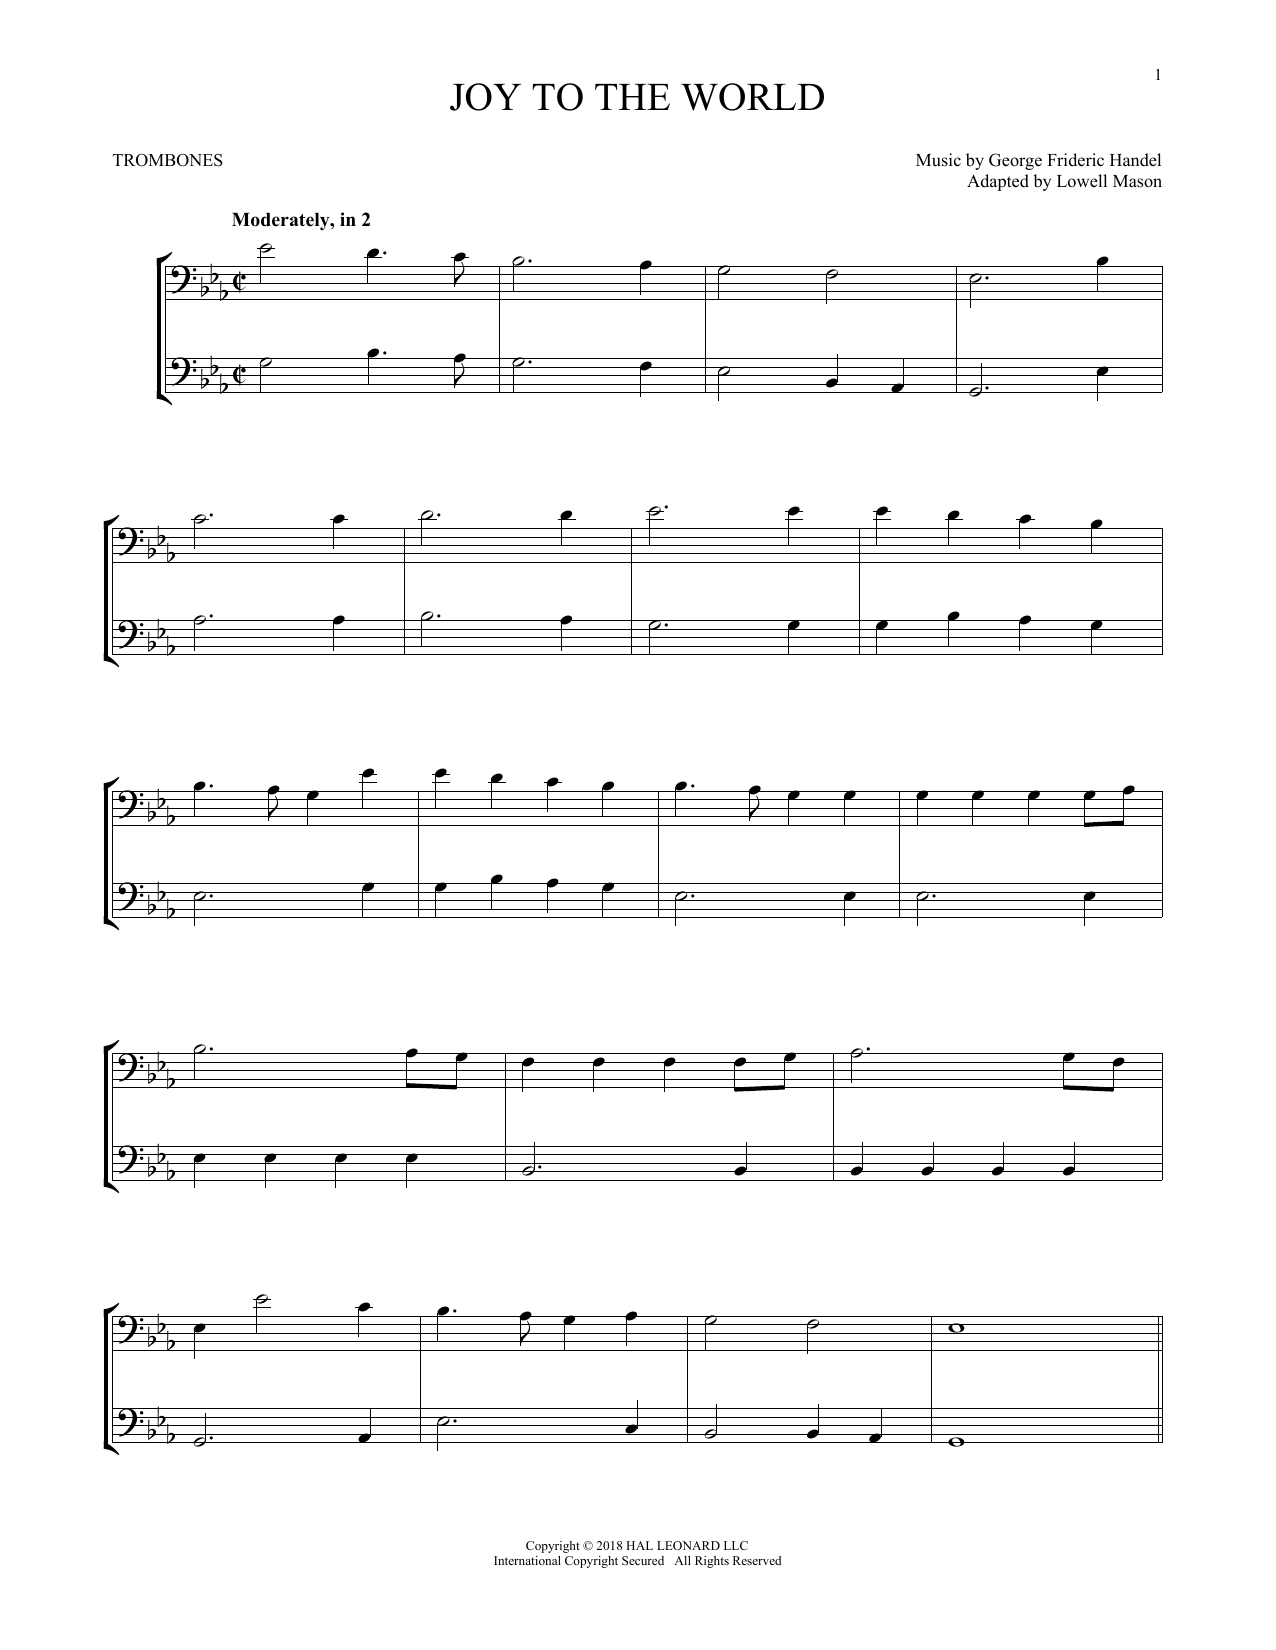 Joy To The World (Trombone Transcription)